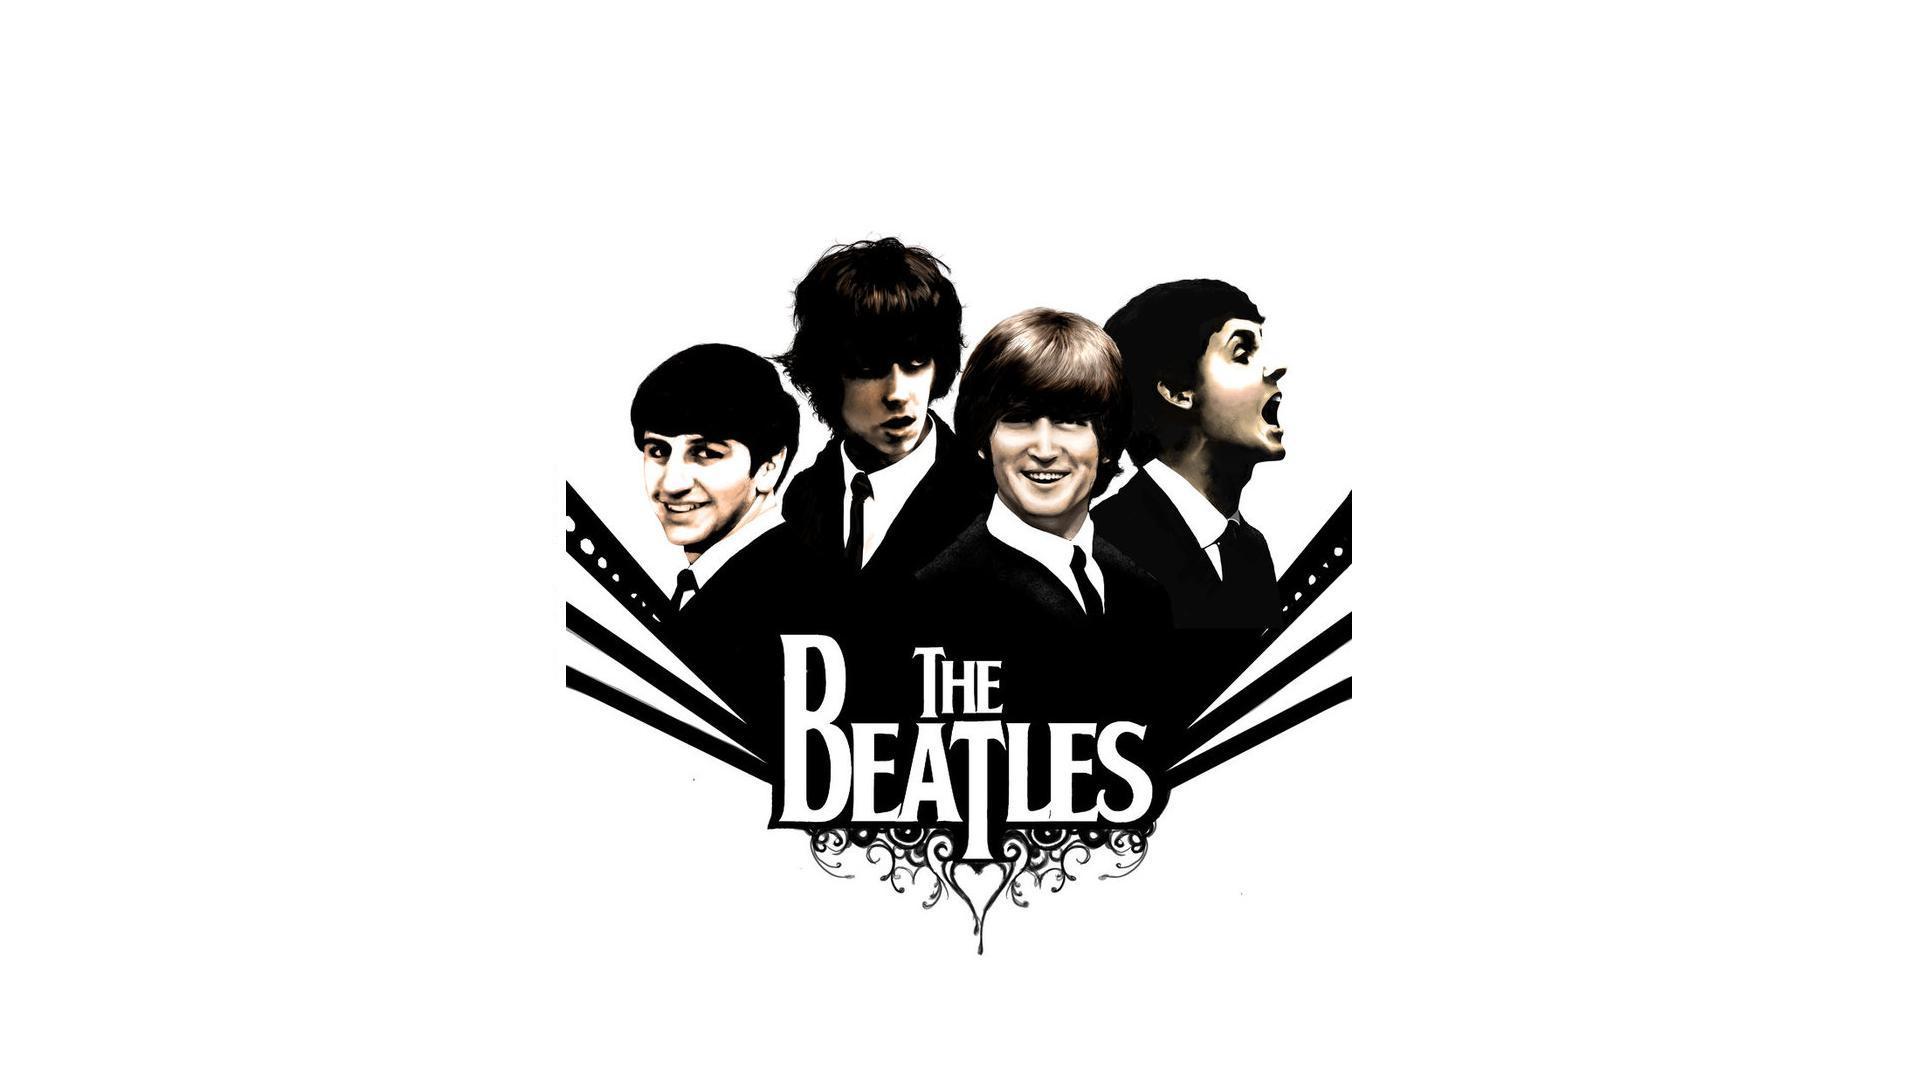 beatles legend john lennon paul mccartney wallpapers music   download 1920x1080